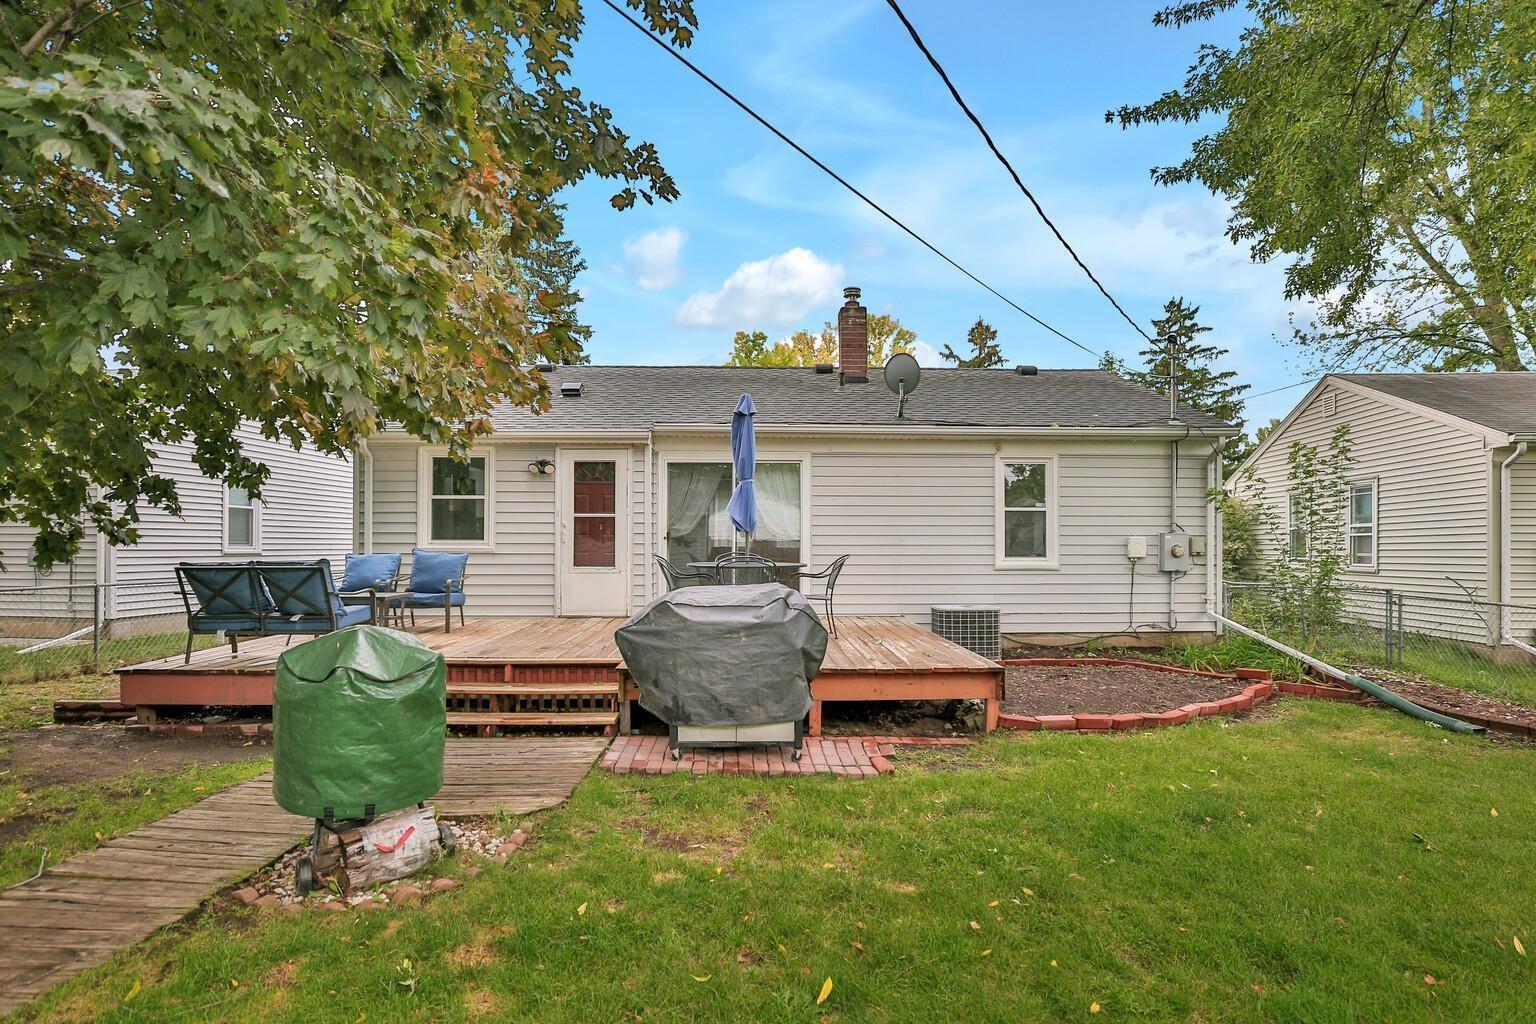 Photo of 1715 Iowa Avenue E, Saint Paul, MN 55106 (MLS # 6102556)